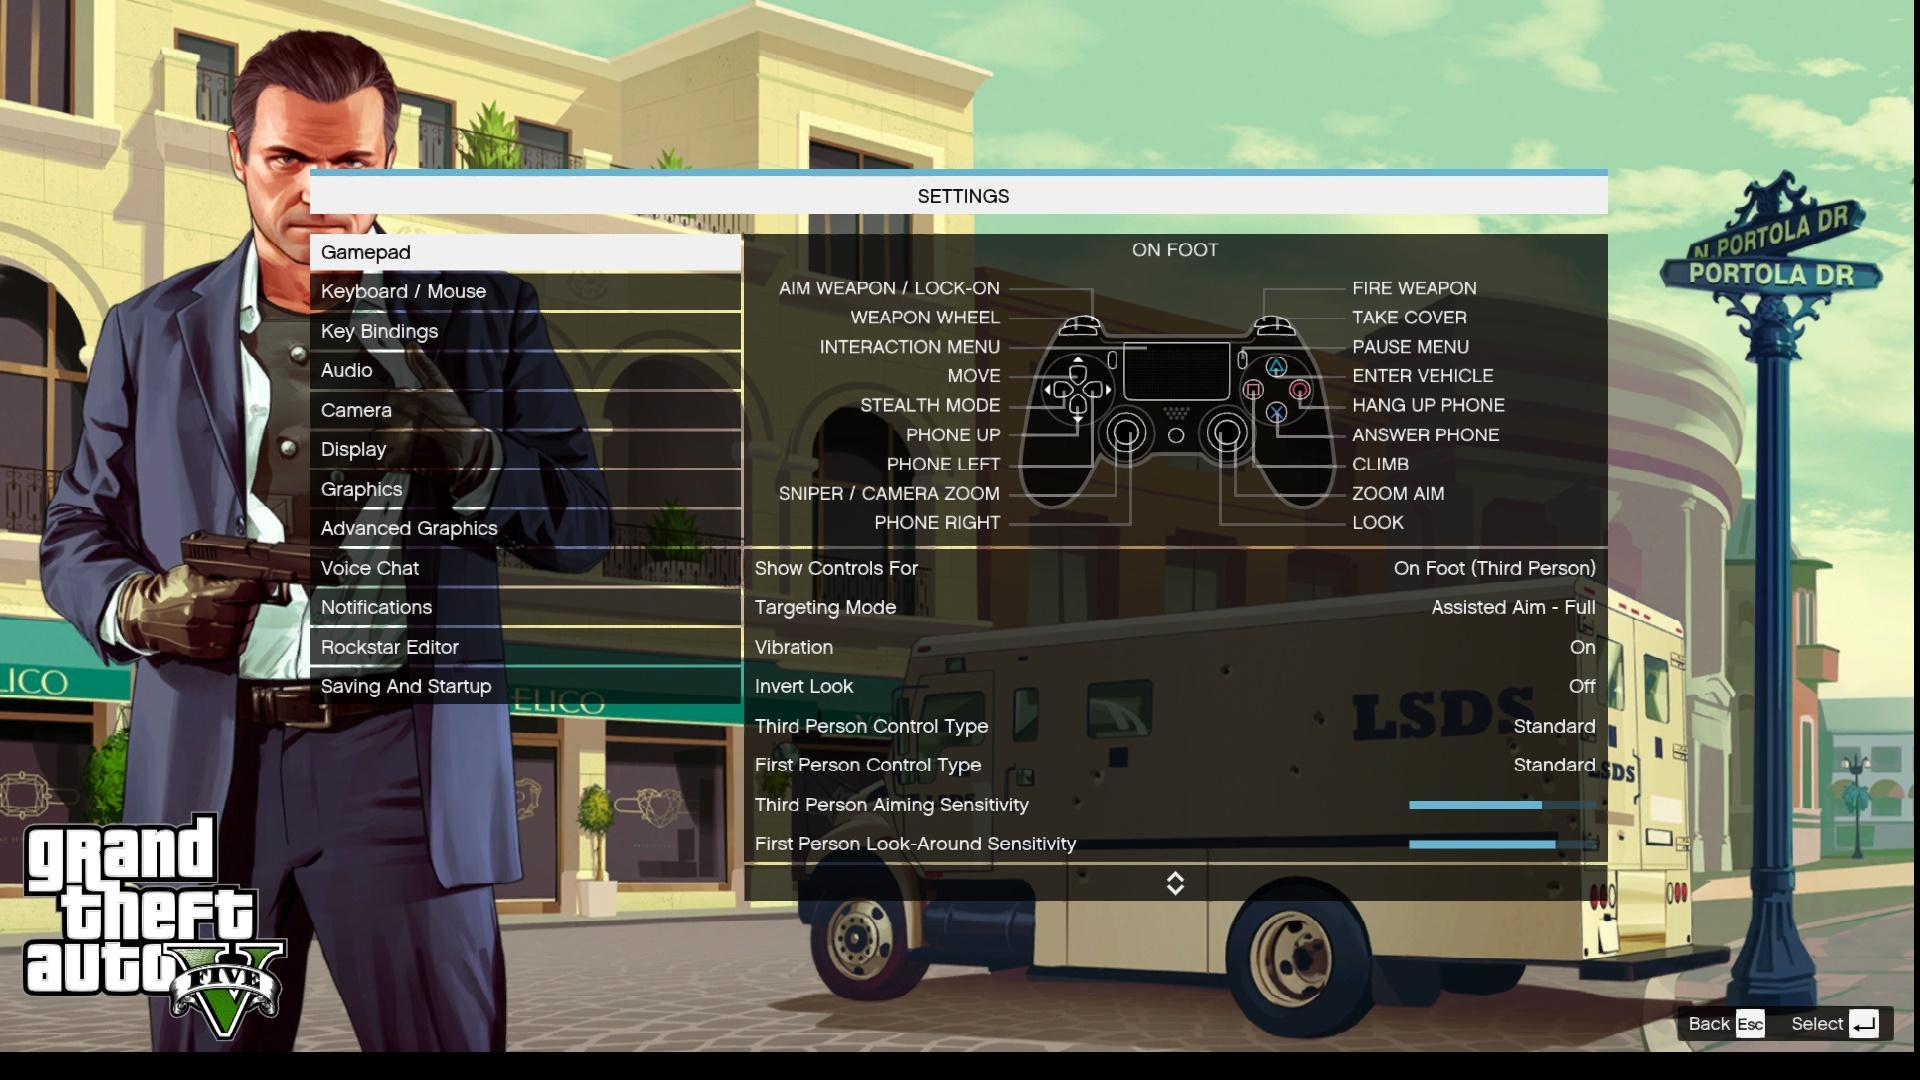 DualShock 4 Settings Screen Diagrams w/ Touchpad